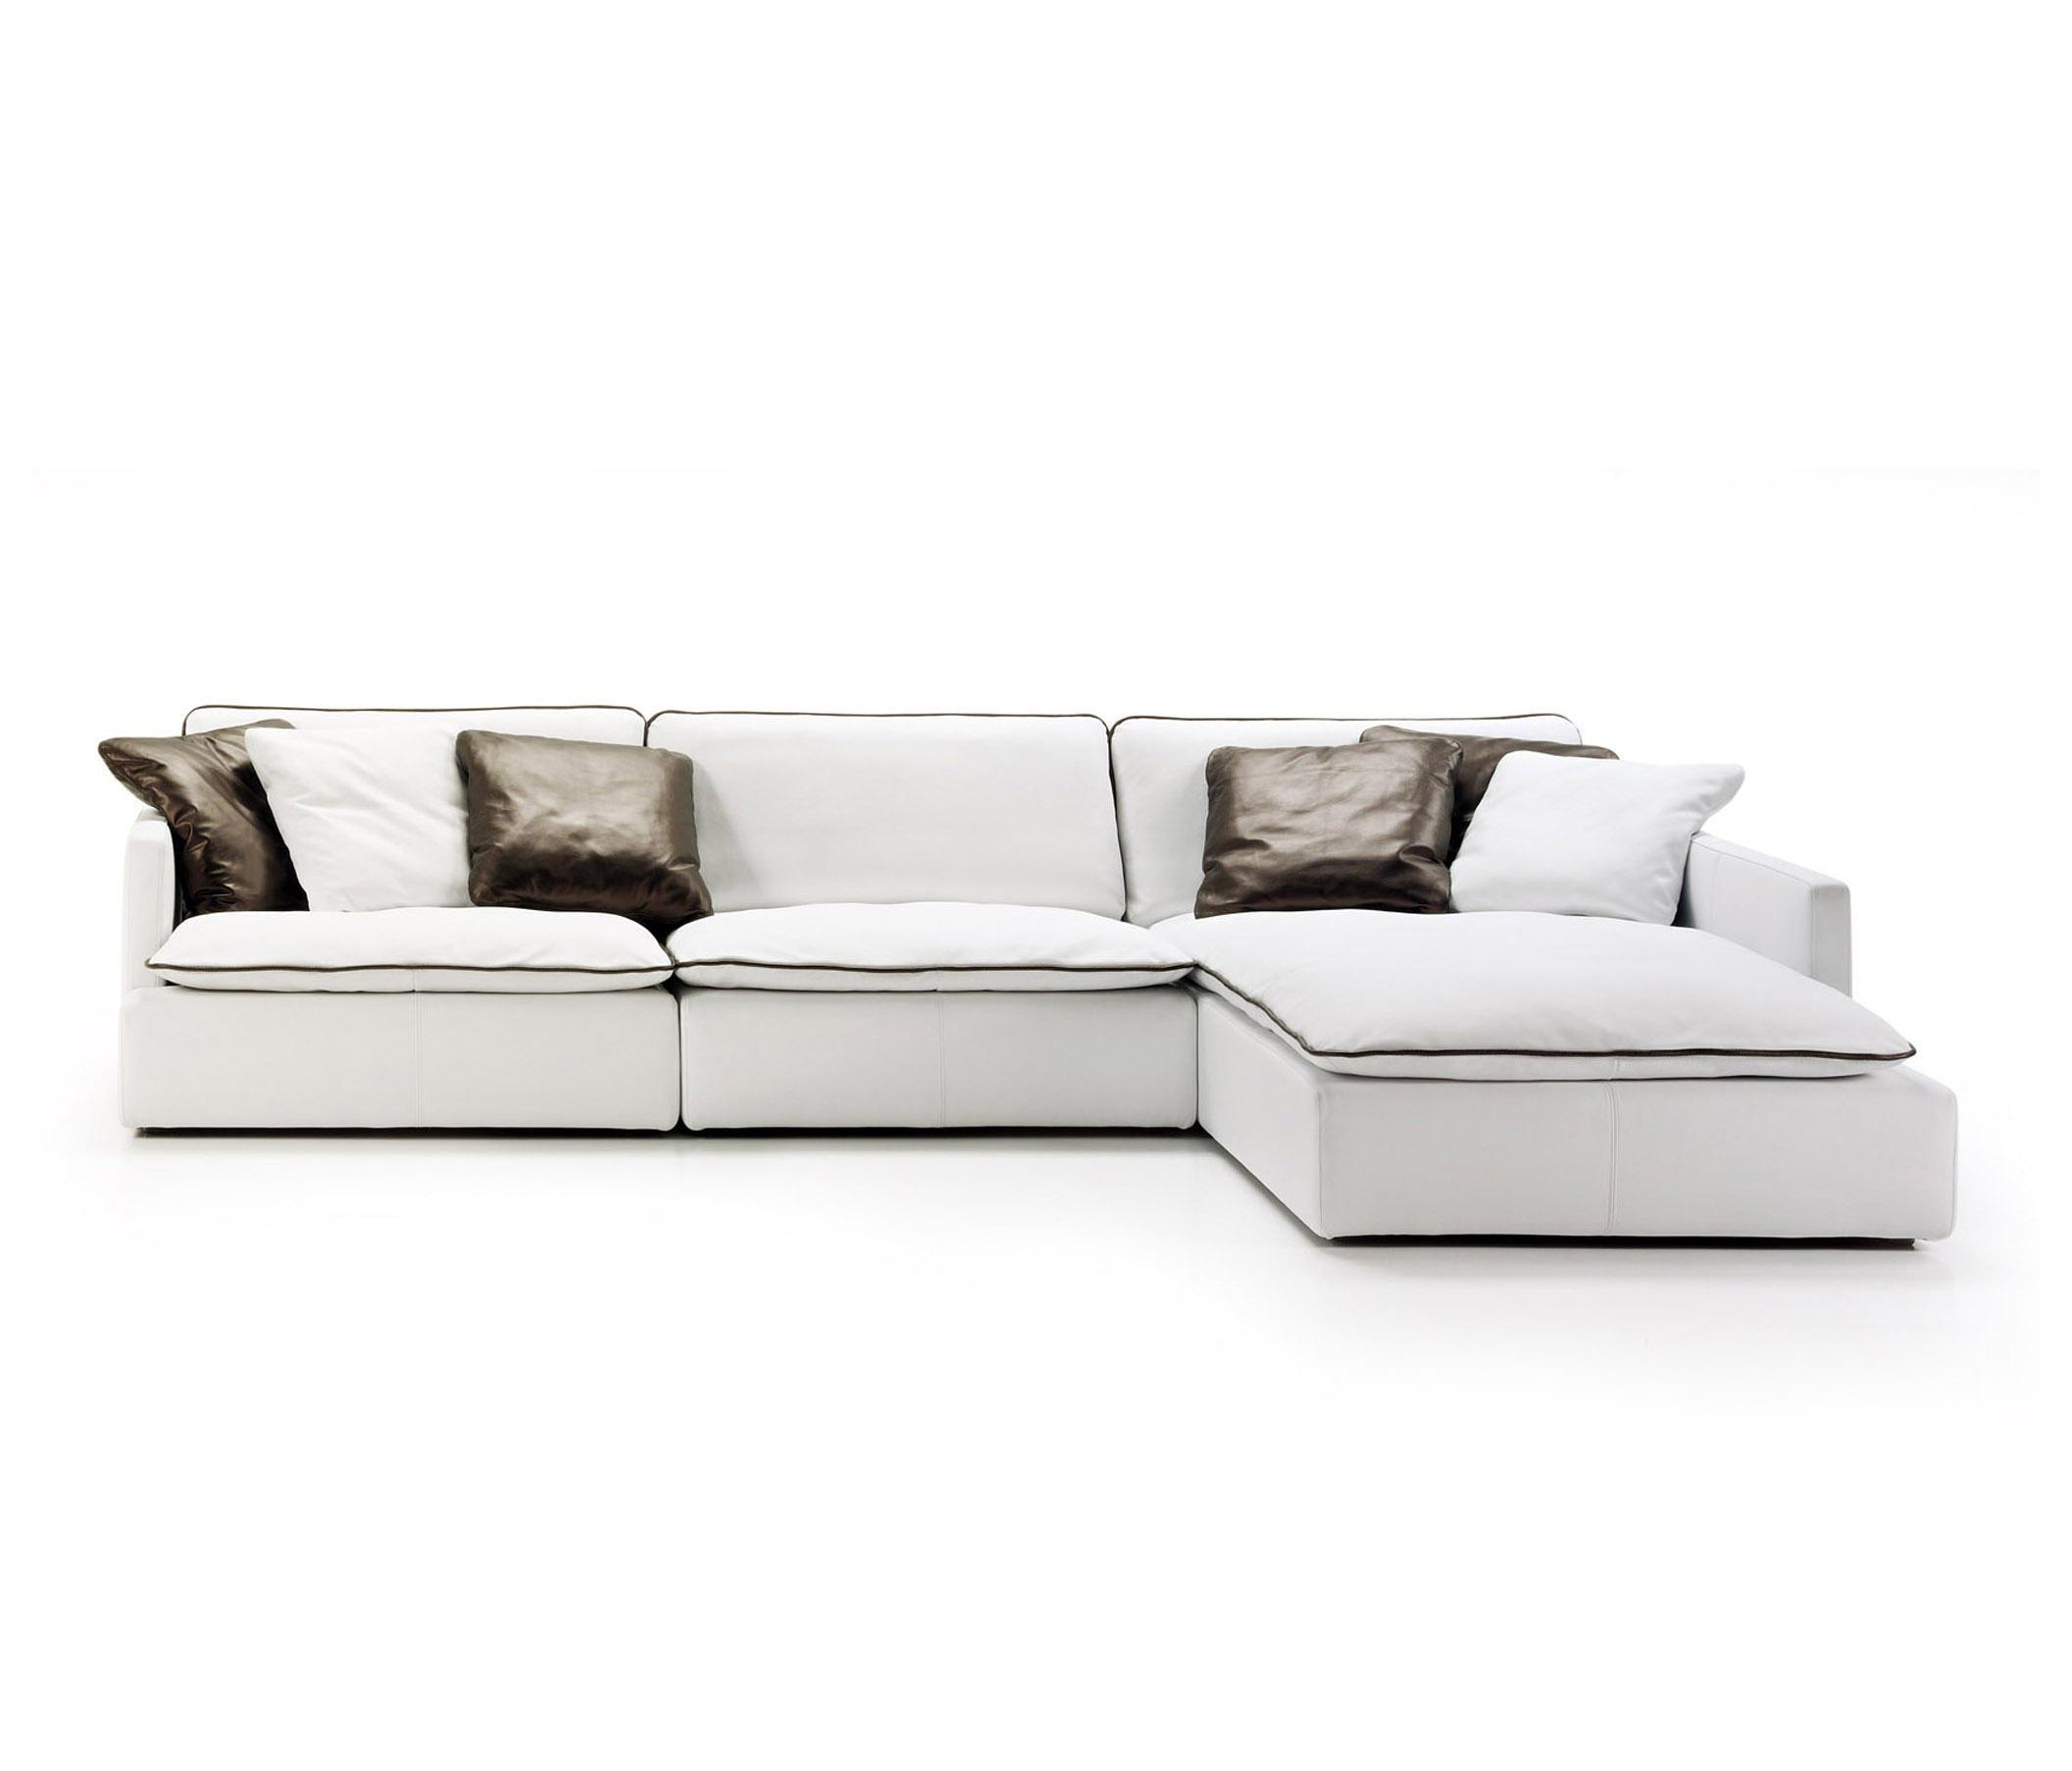 paramount sofa hickory chair prices sofas von estel group architonic